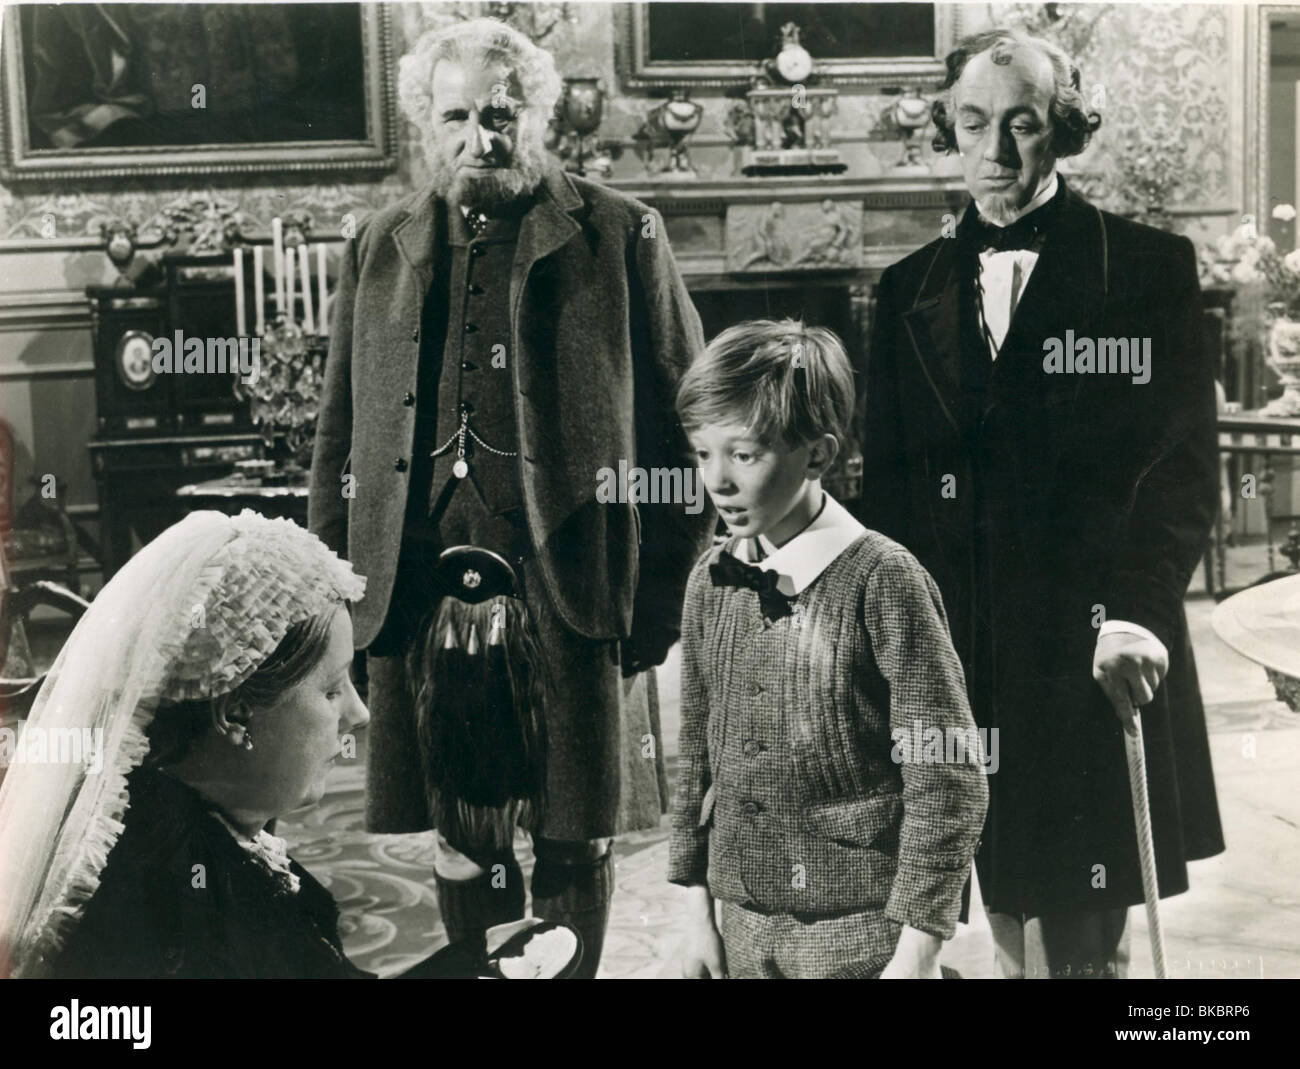 THE MUDLARK (1950) IRENE DUNNE, ANDREW RAY, ALEC GUINNESS MUDL 003P Stock Photo